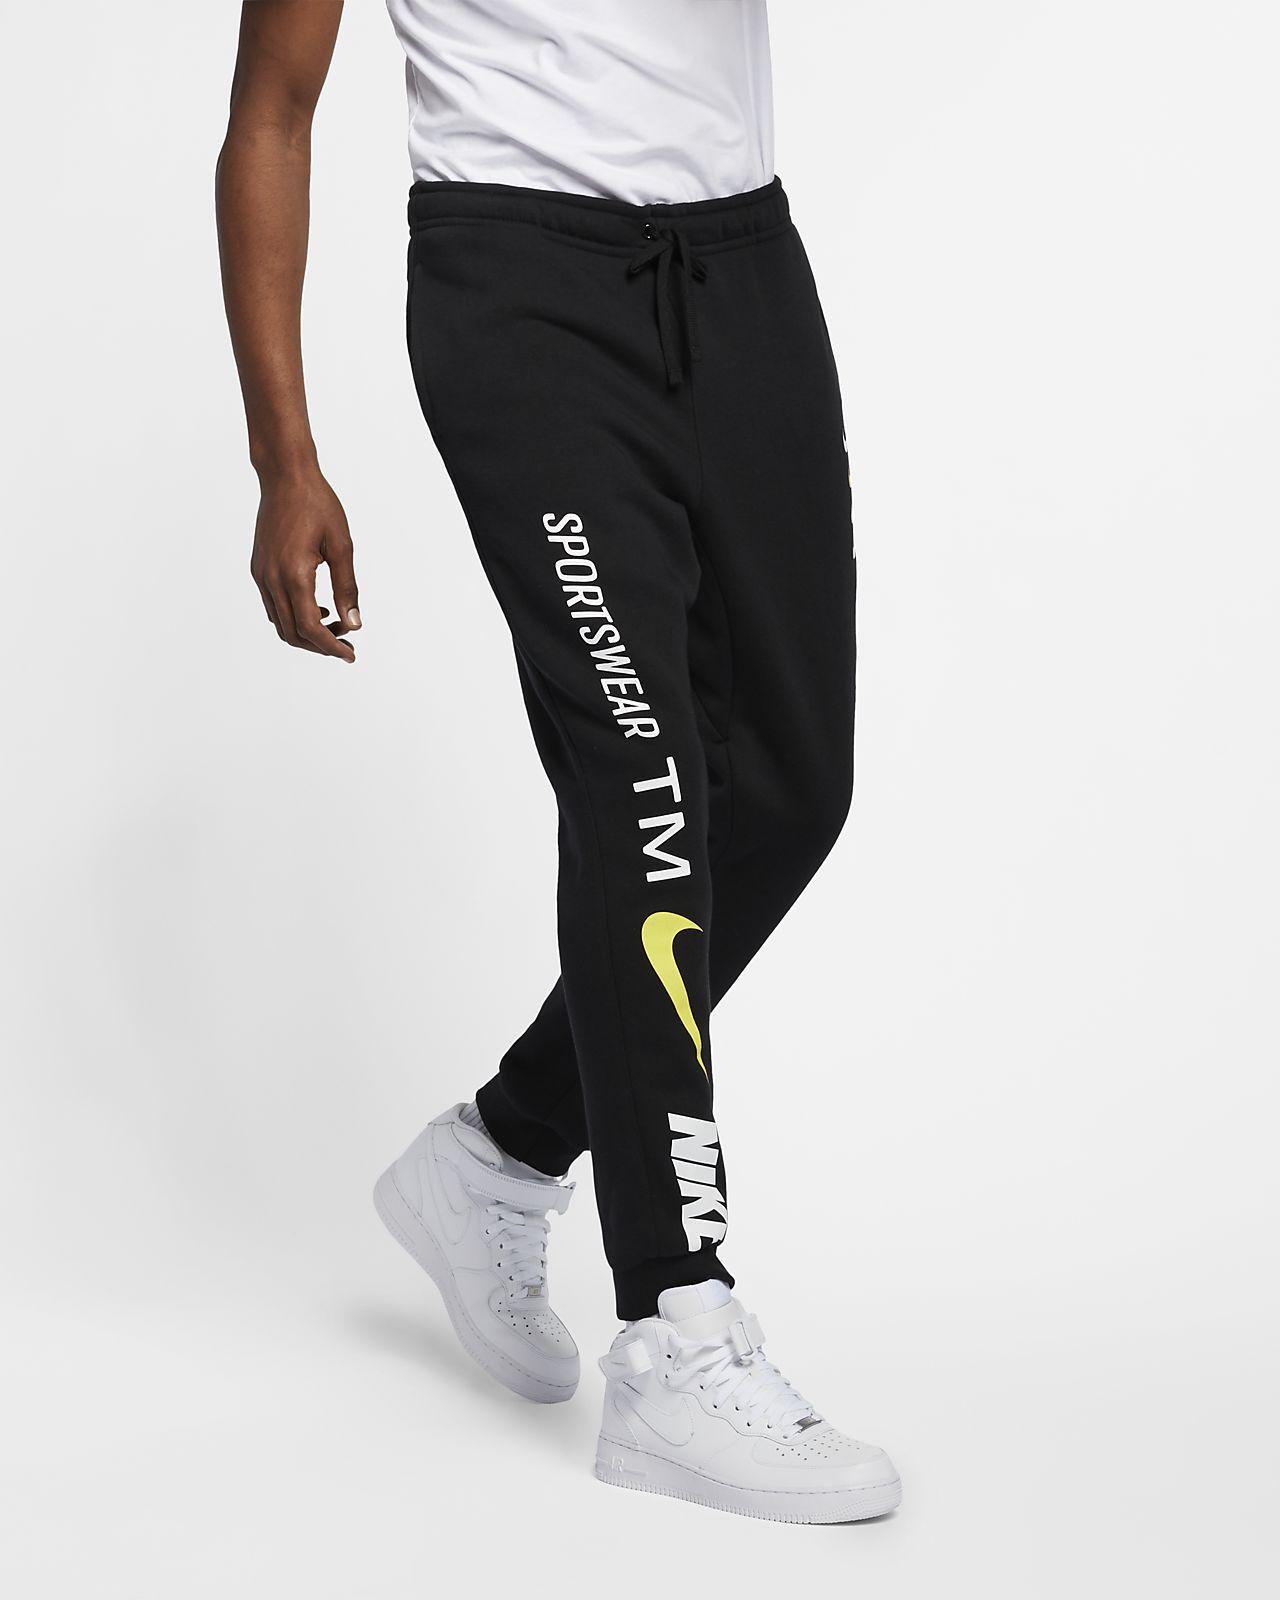 394f08396e Low Resolution Nike Sportswear Club szabadidőnadrág Nike Sportswear Club  szabadidőnadrág